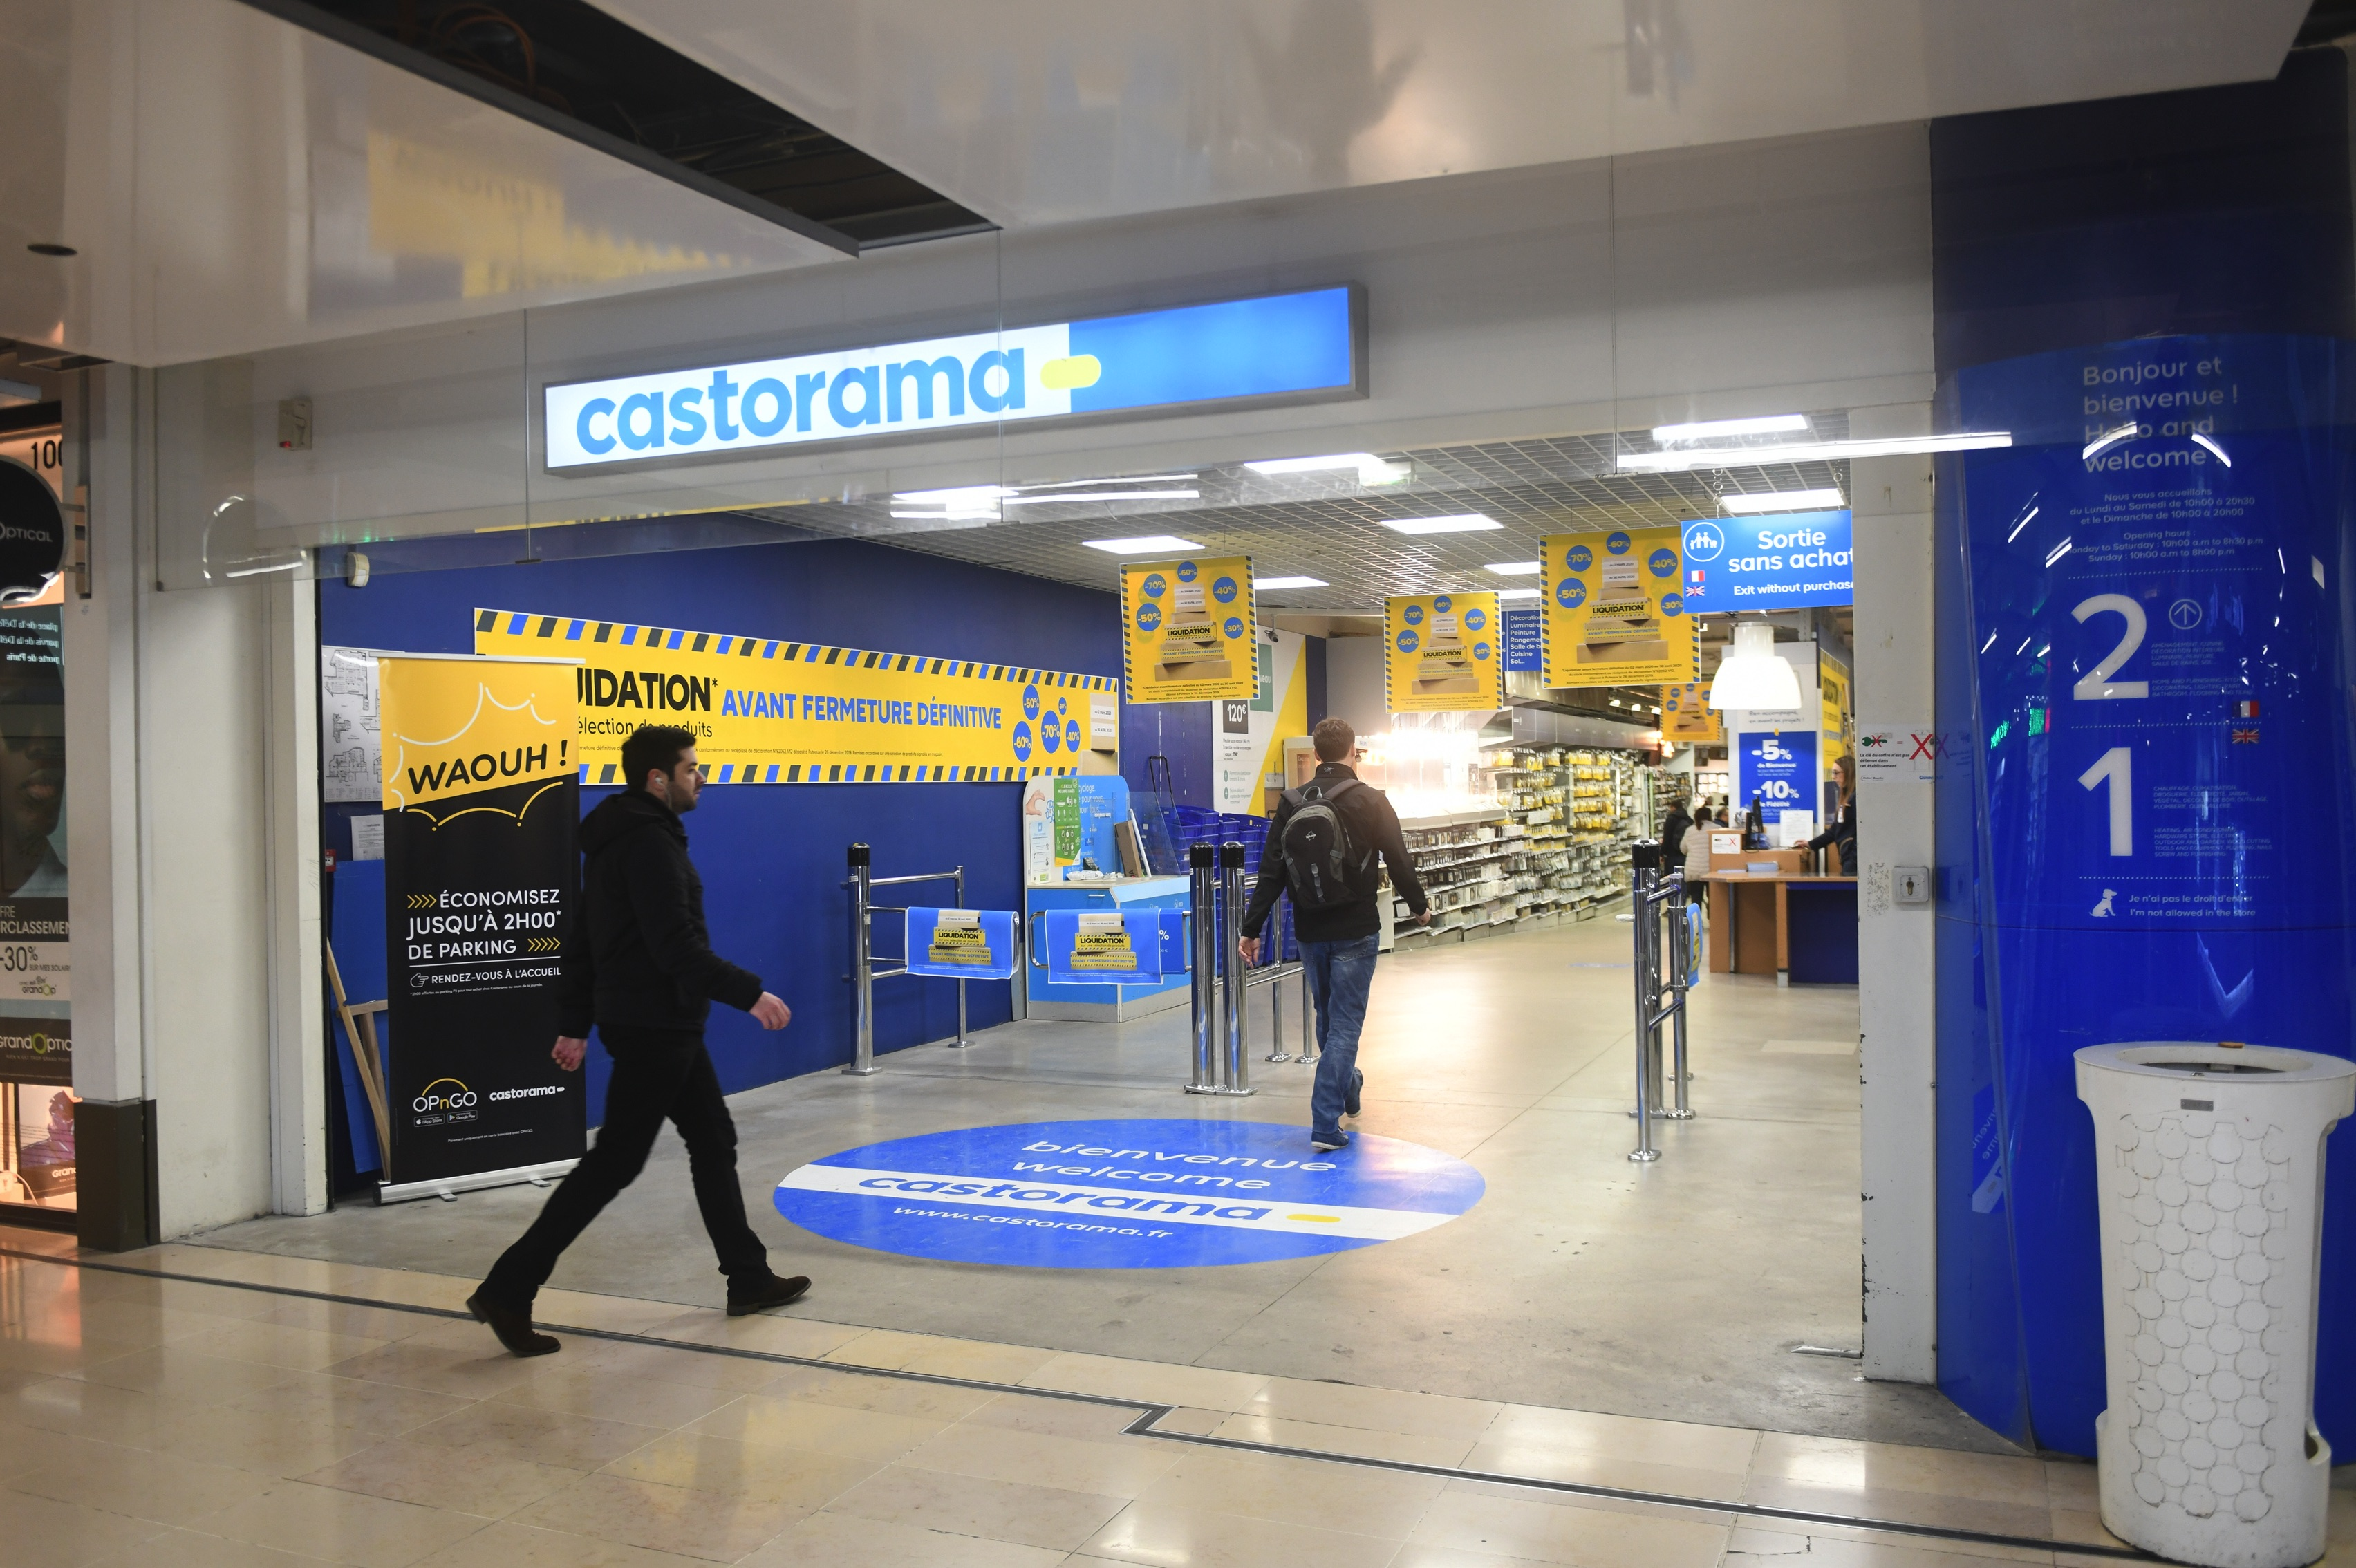 Pot De Graisse Castorama castorama liquide ses stocks avant de faire tomber le rideau